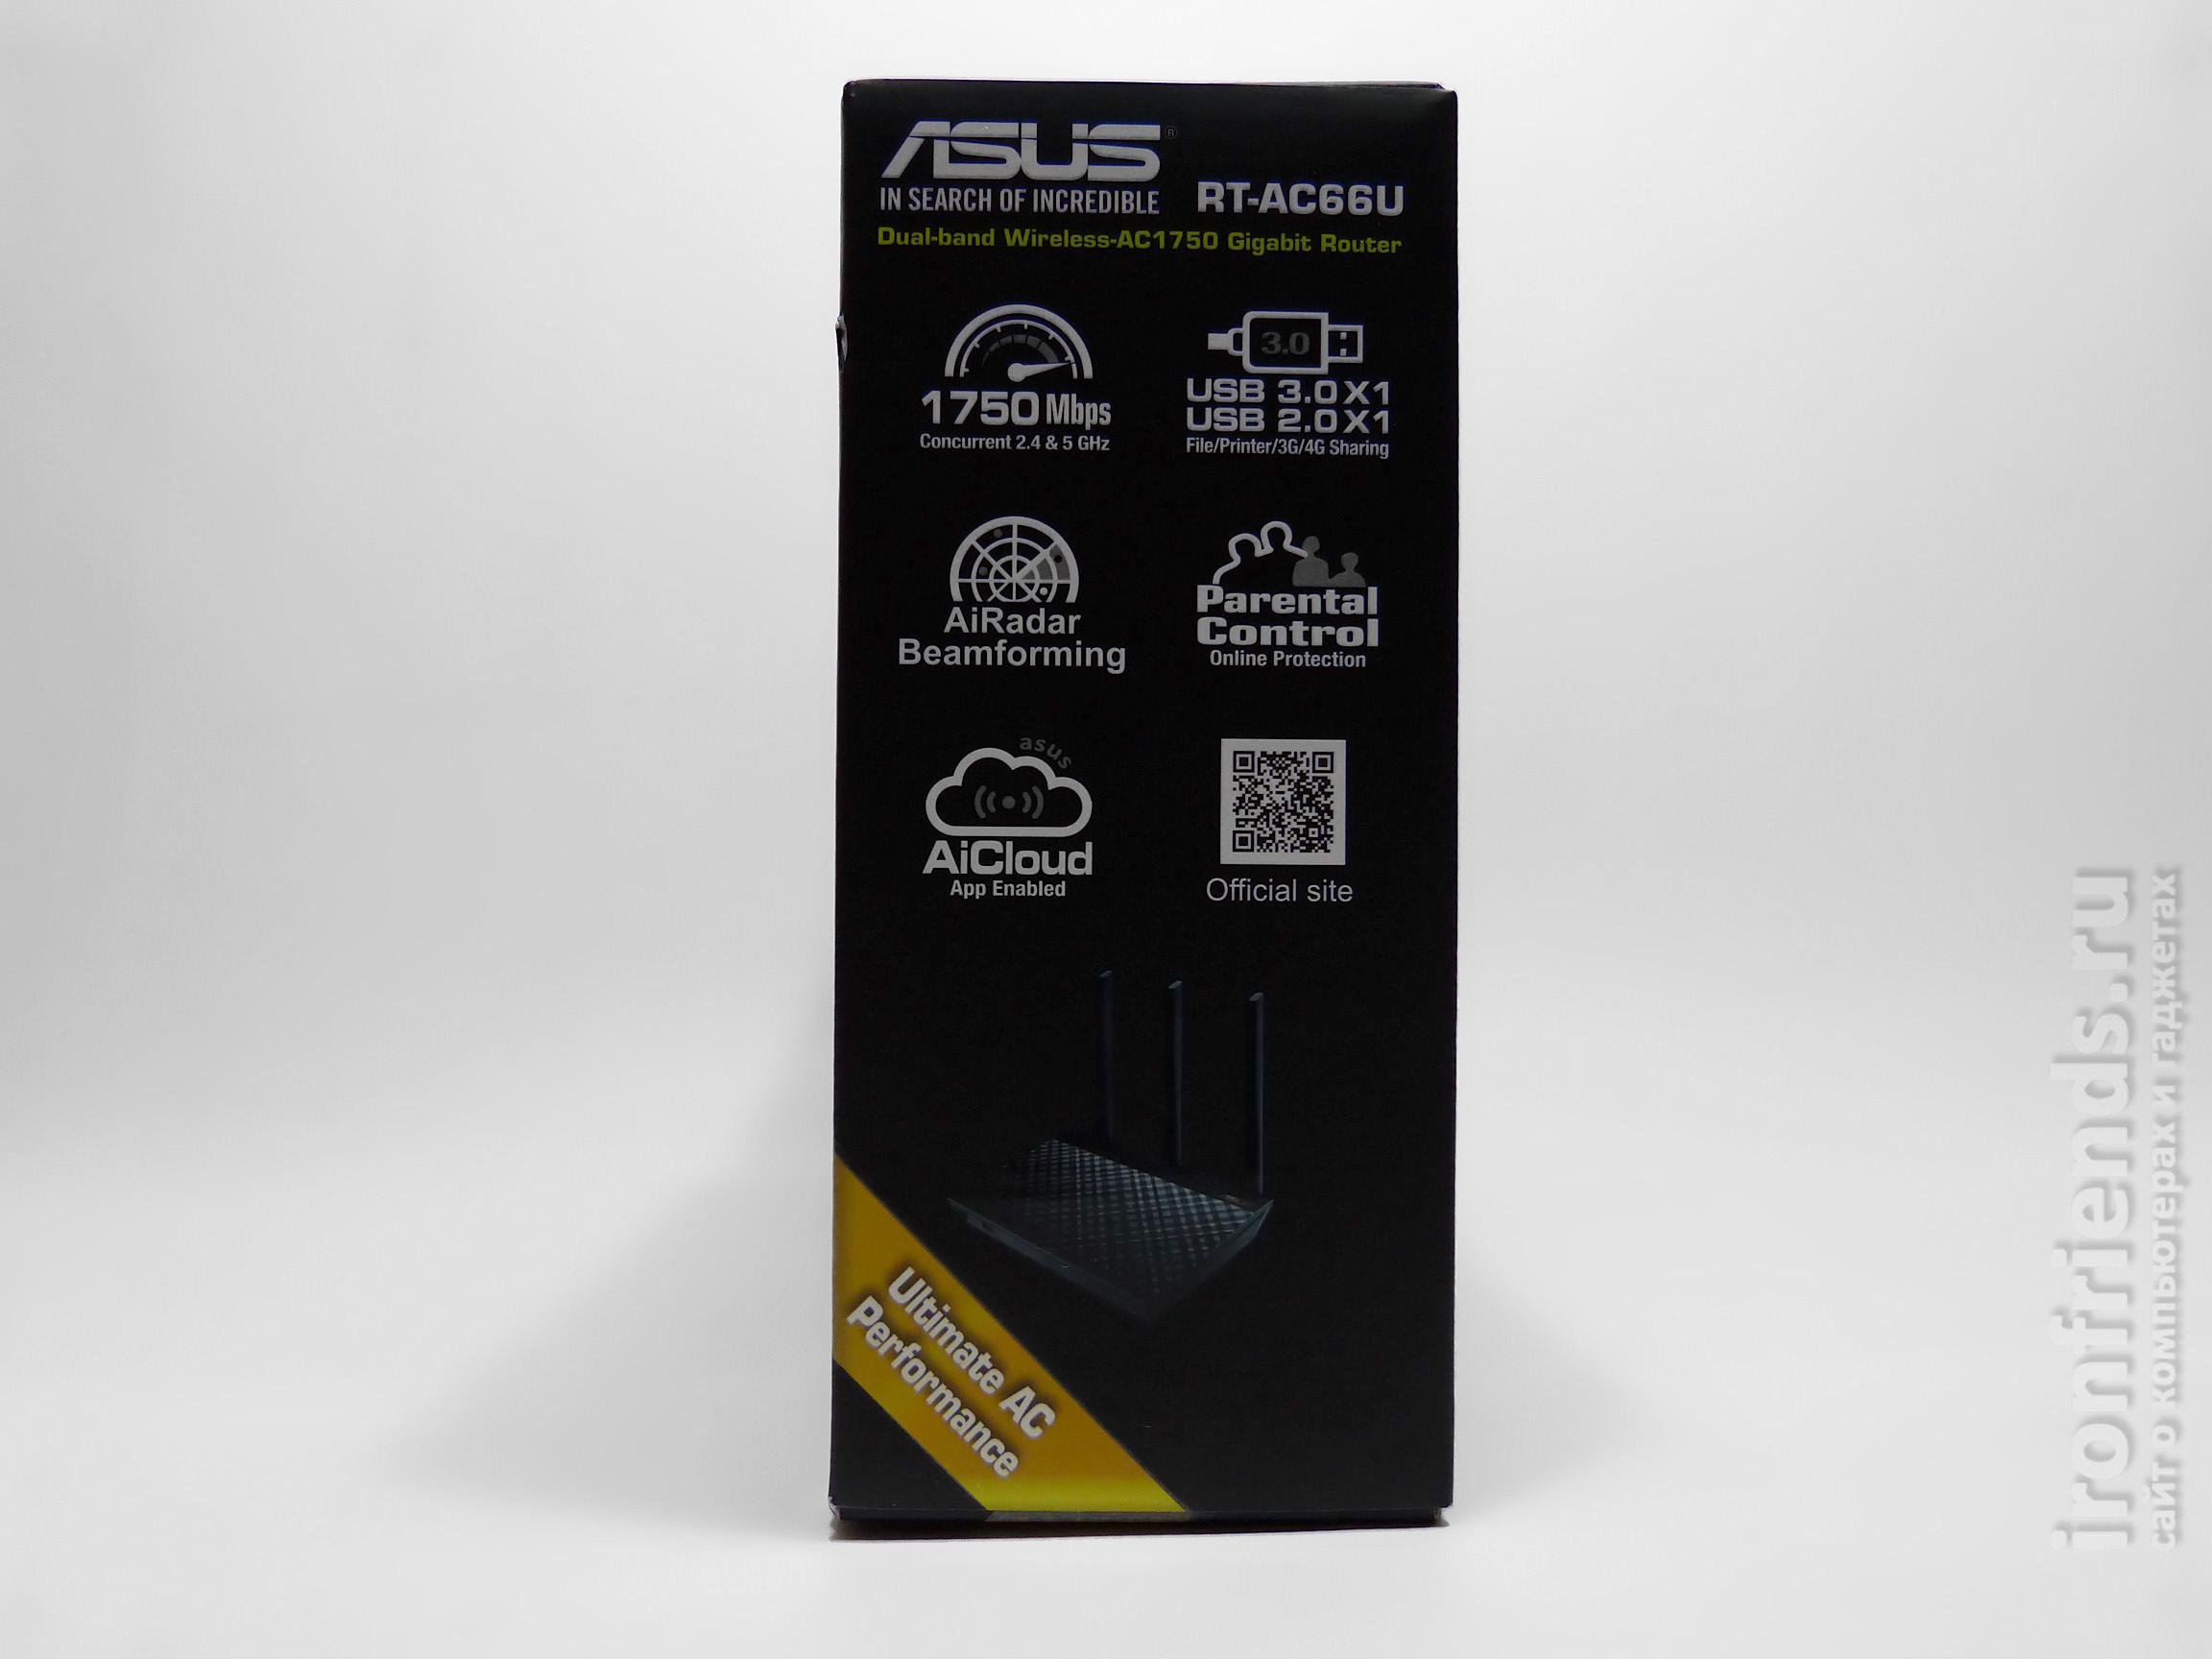 Характеристики ASUS RT-AC66U B1